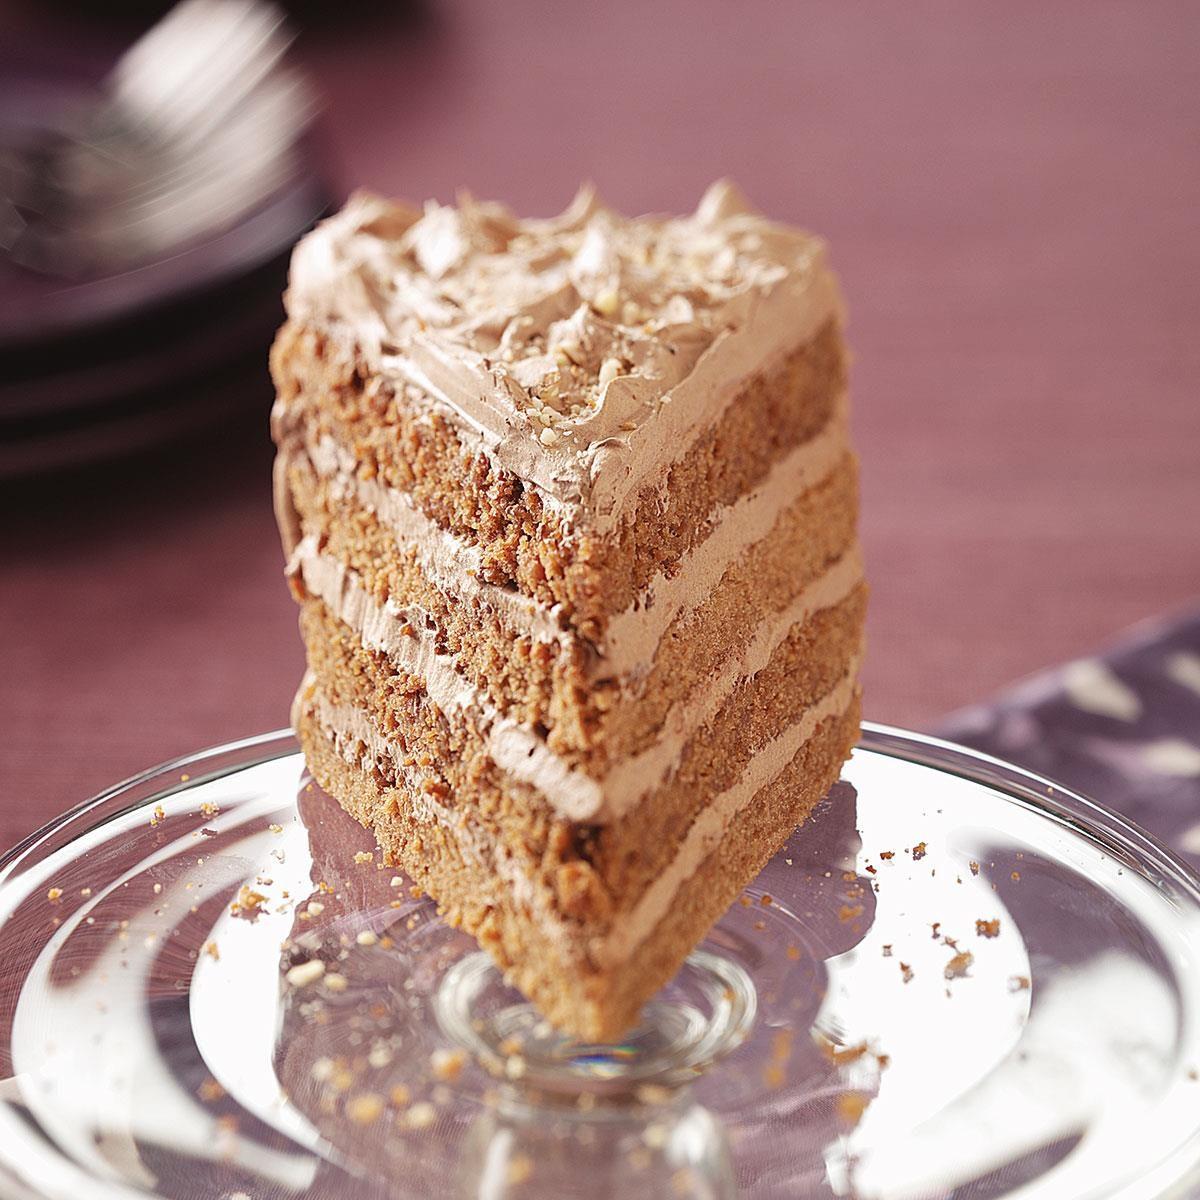 Chocolate Lover's Delight Cake